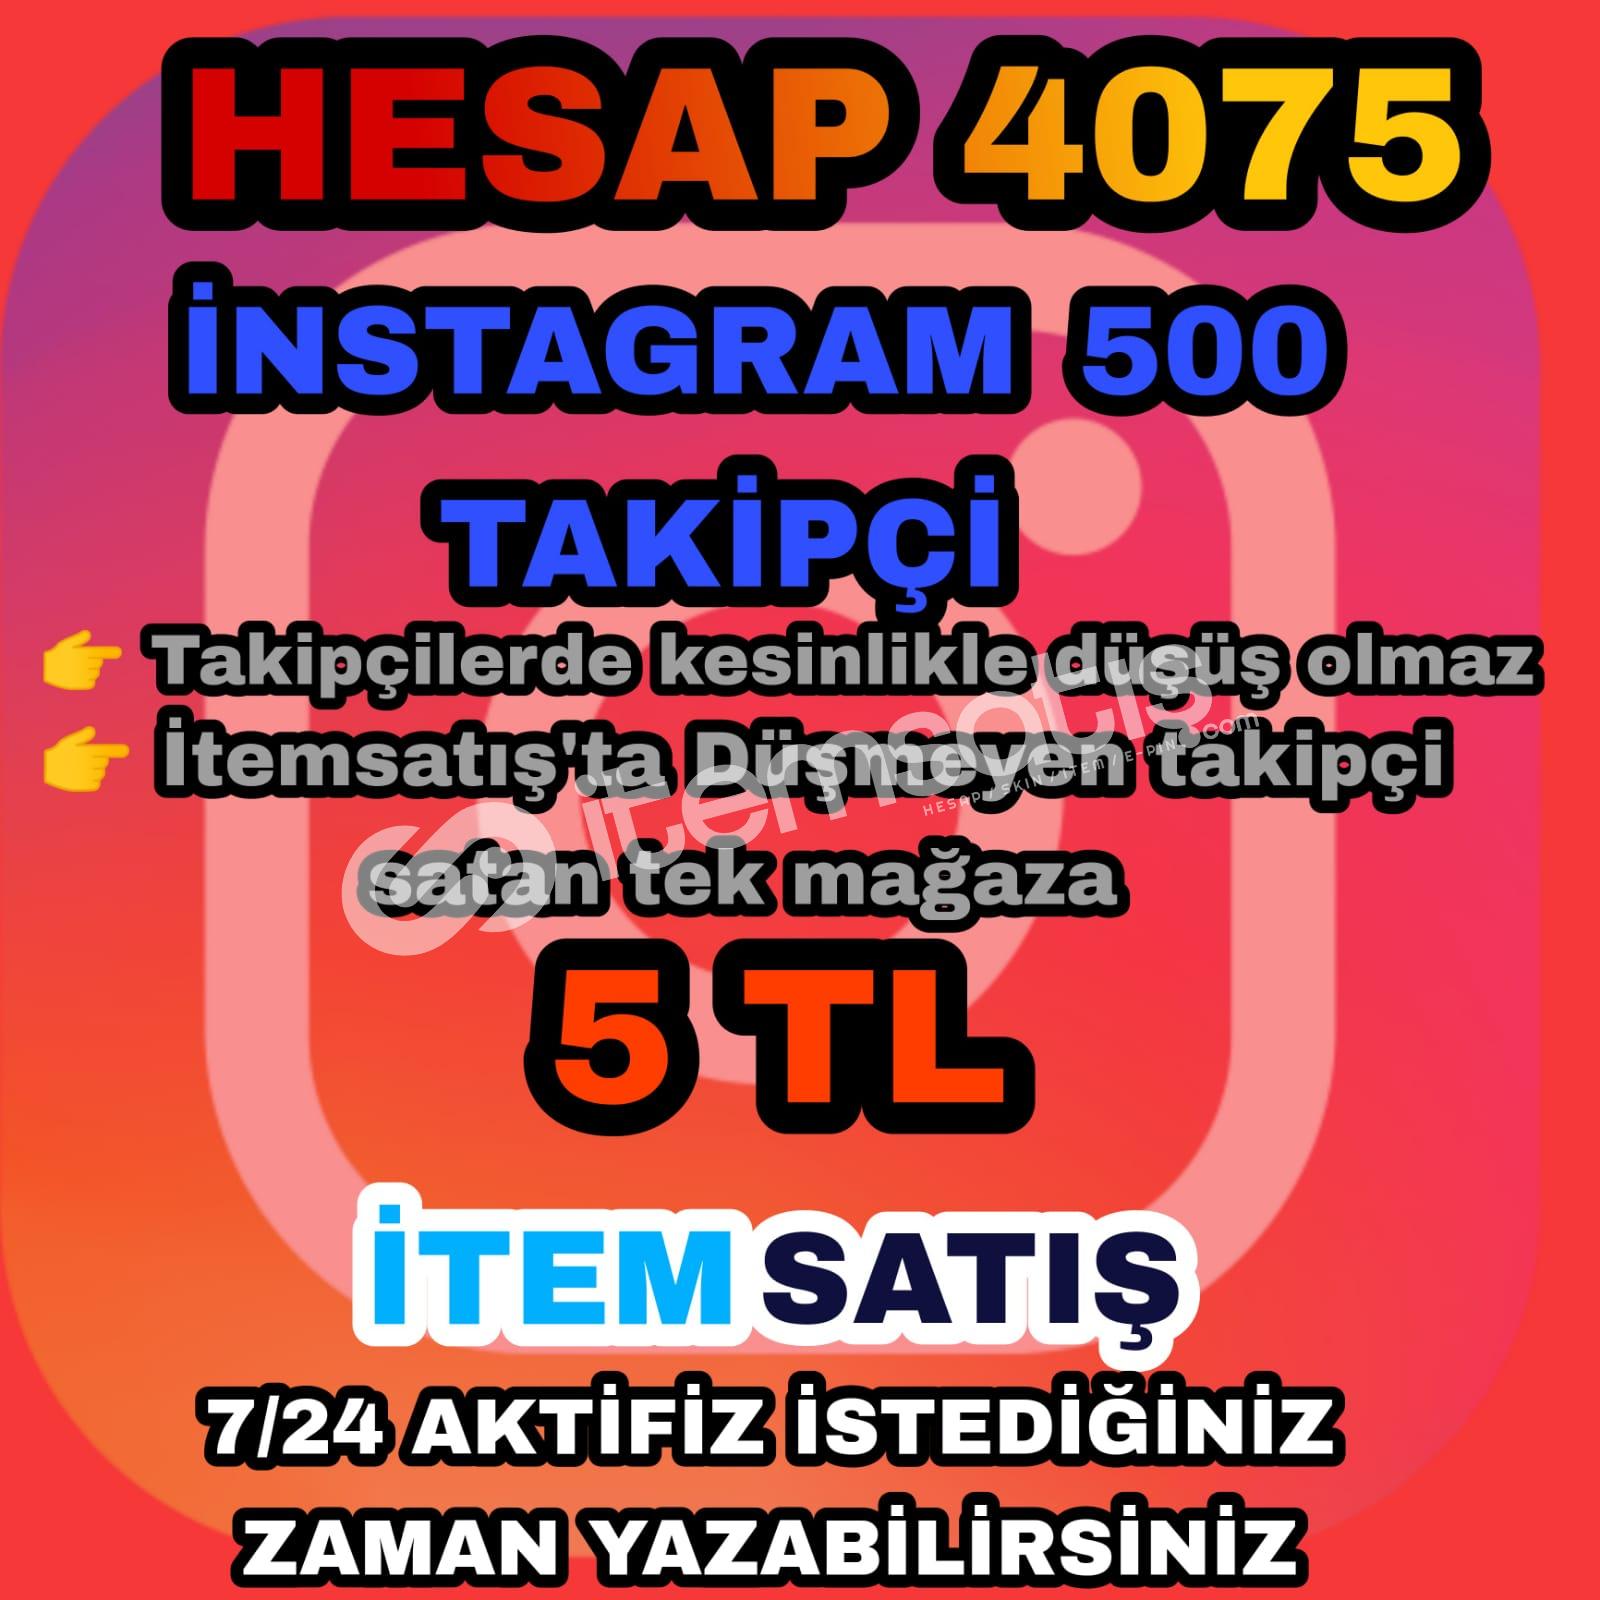 İnstegram 500 takipçi